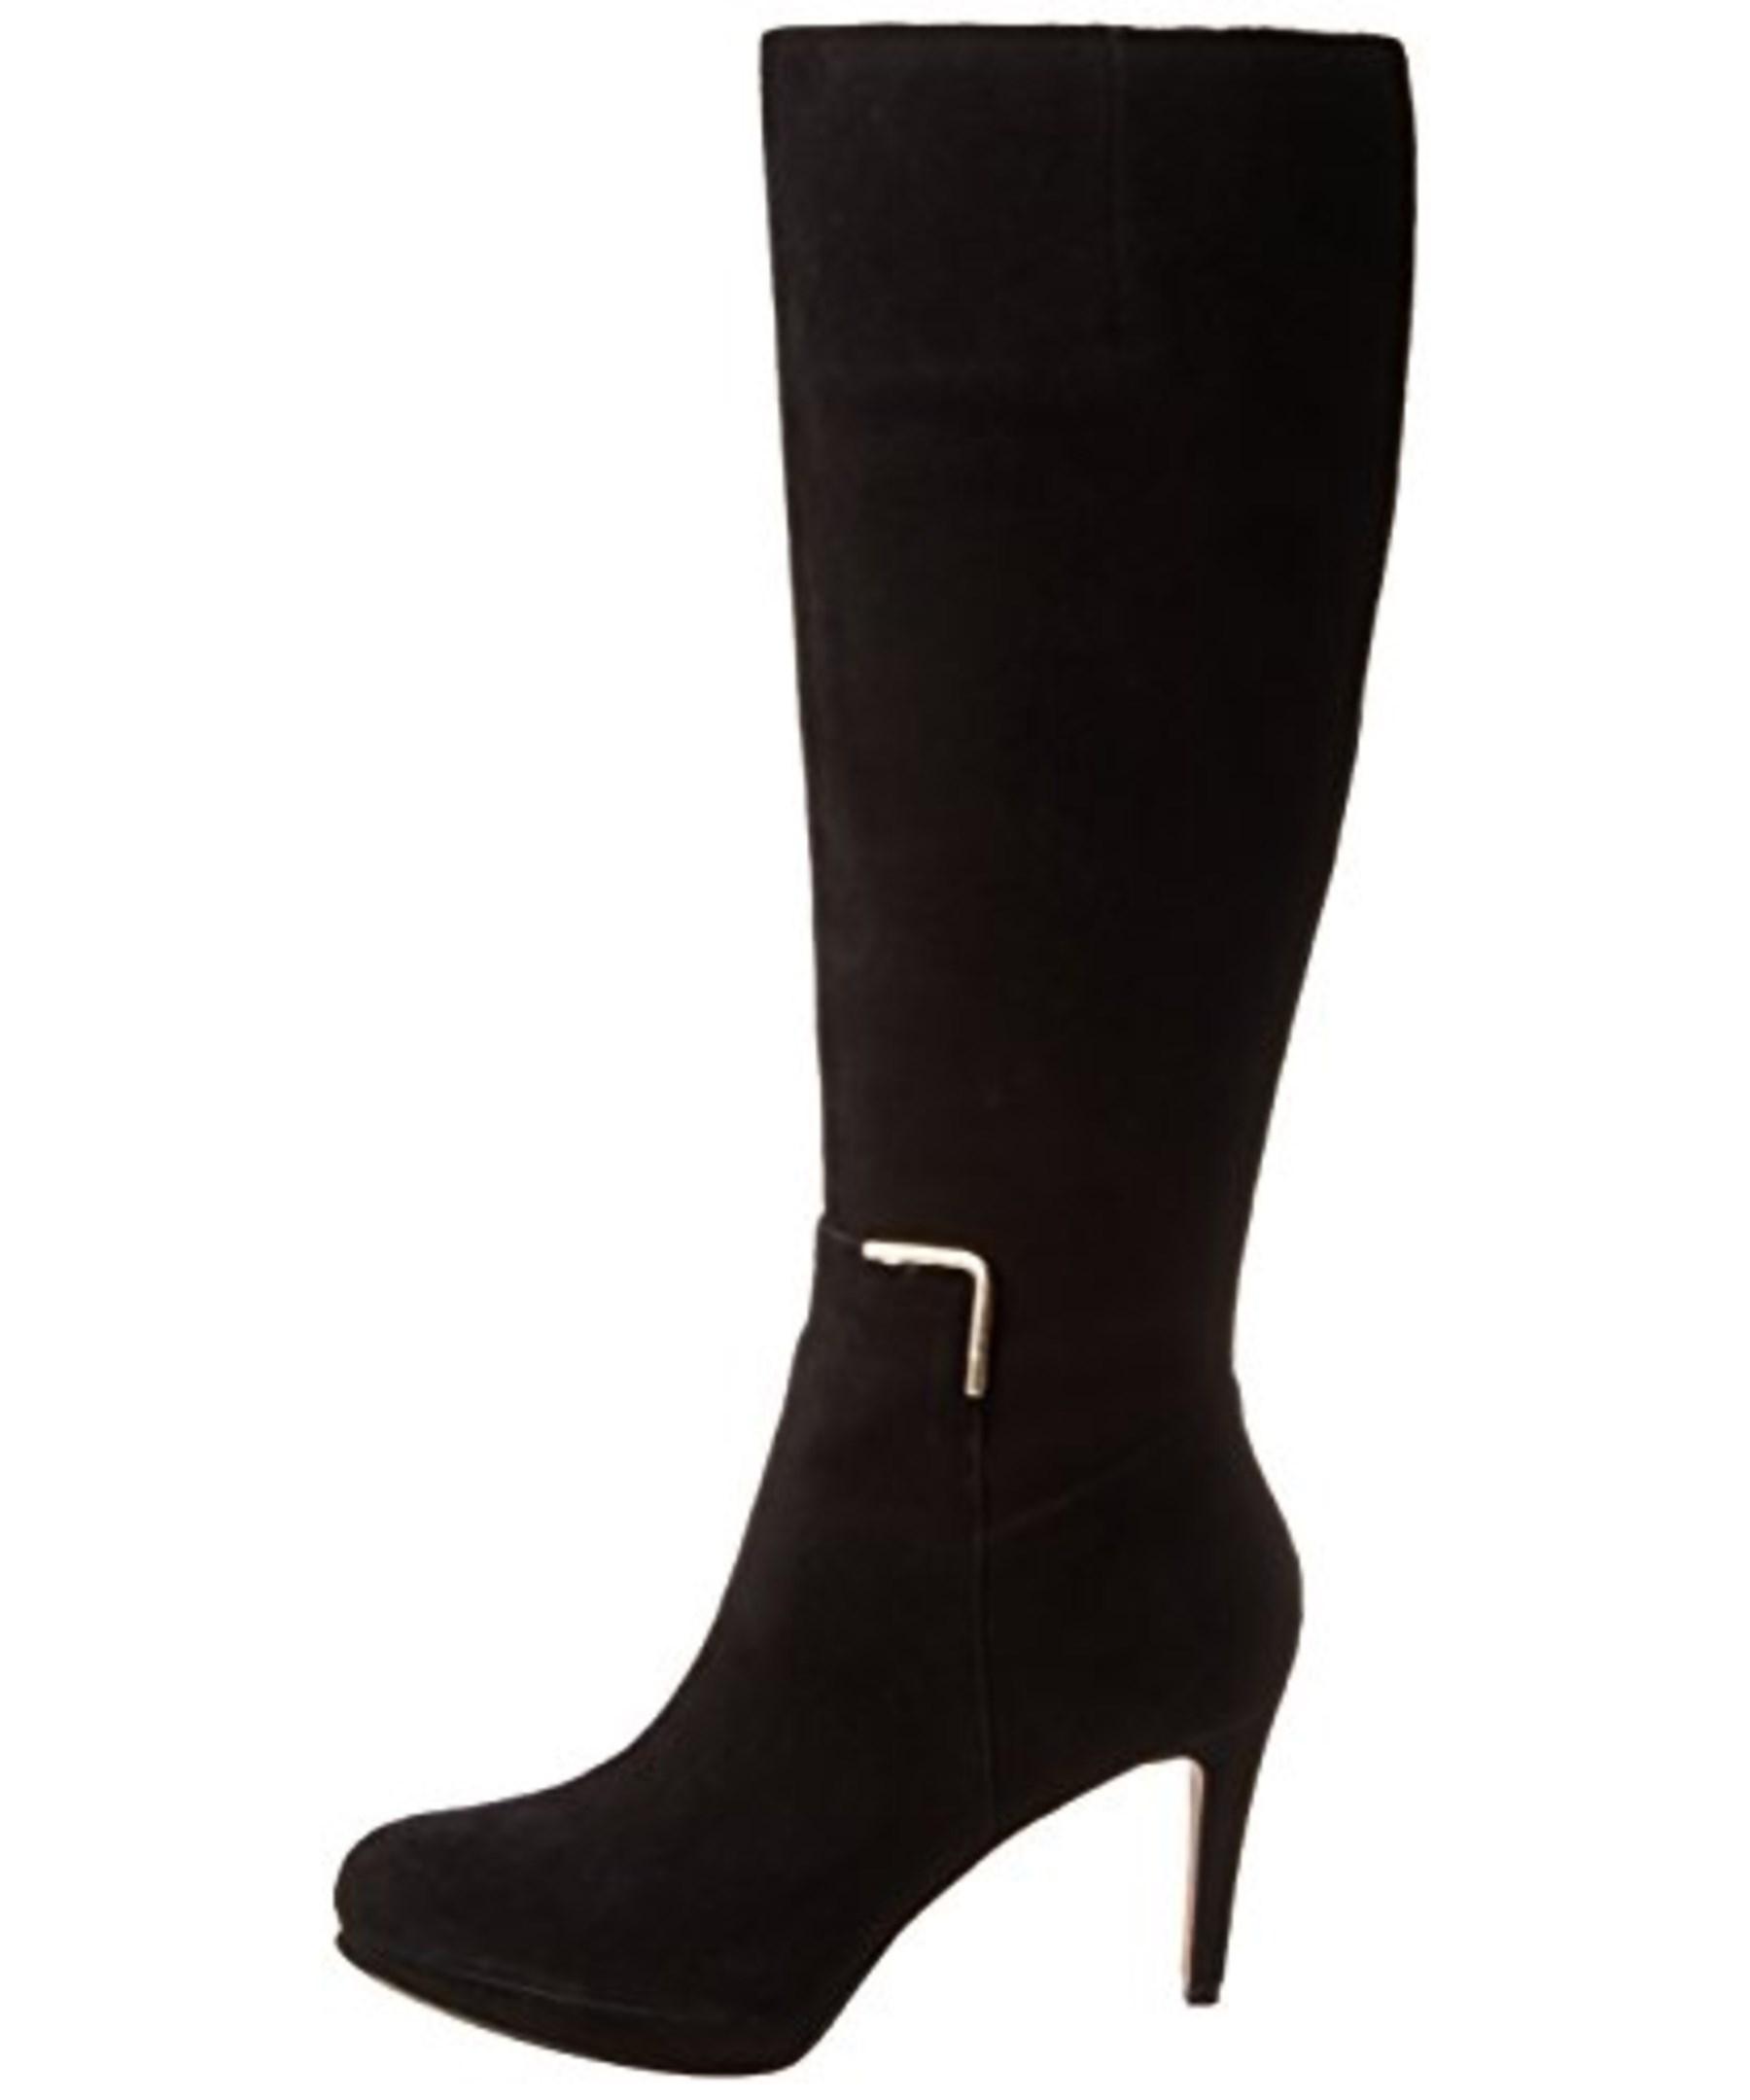 nine west s evah suede knee high heeled dress boots